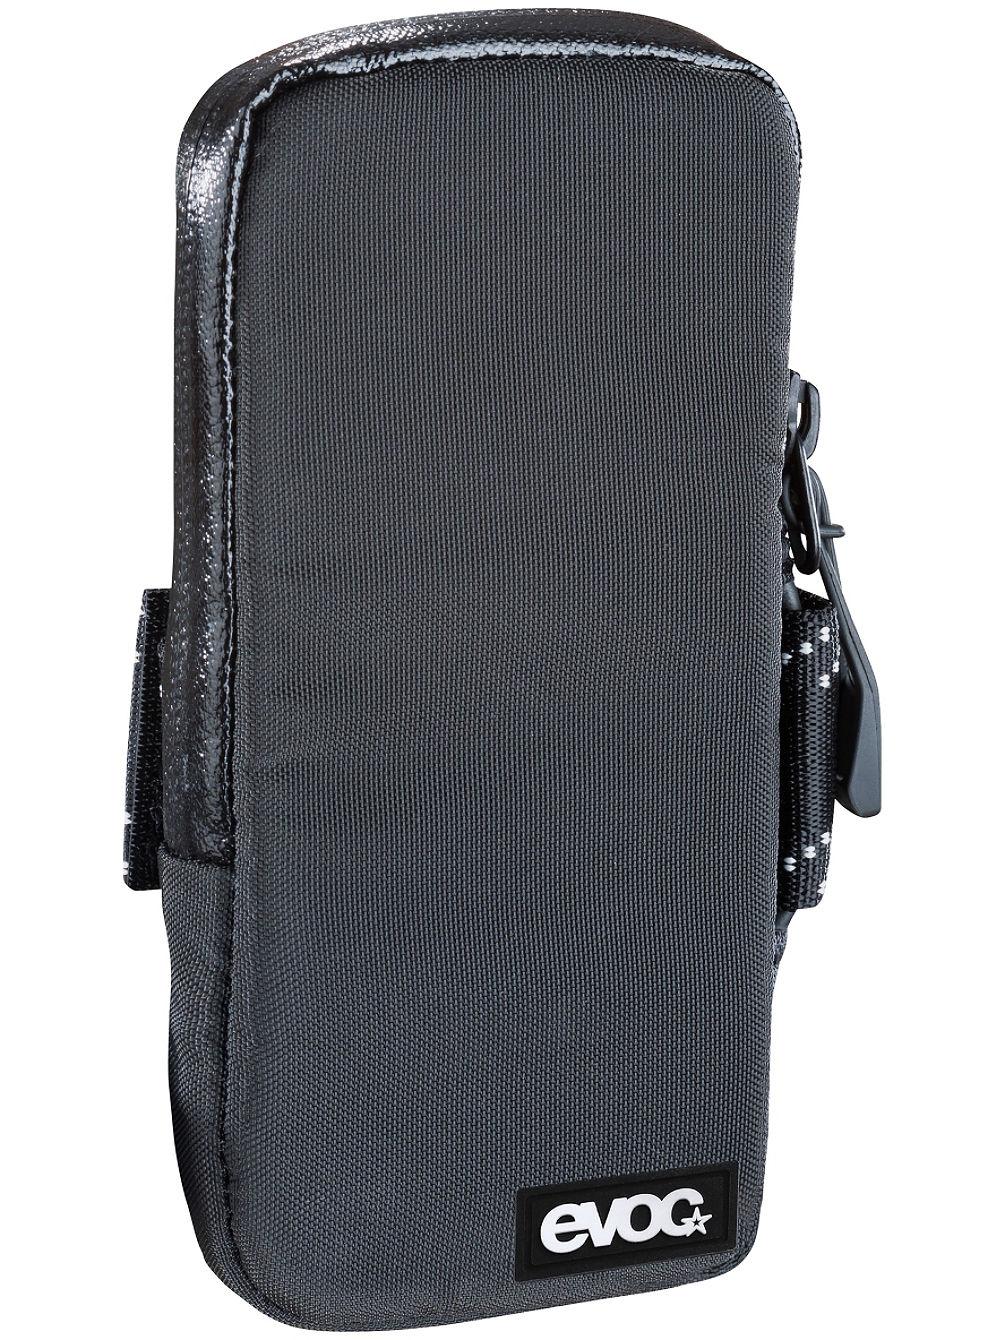 evoc-phone-case